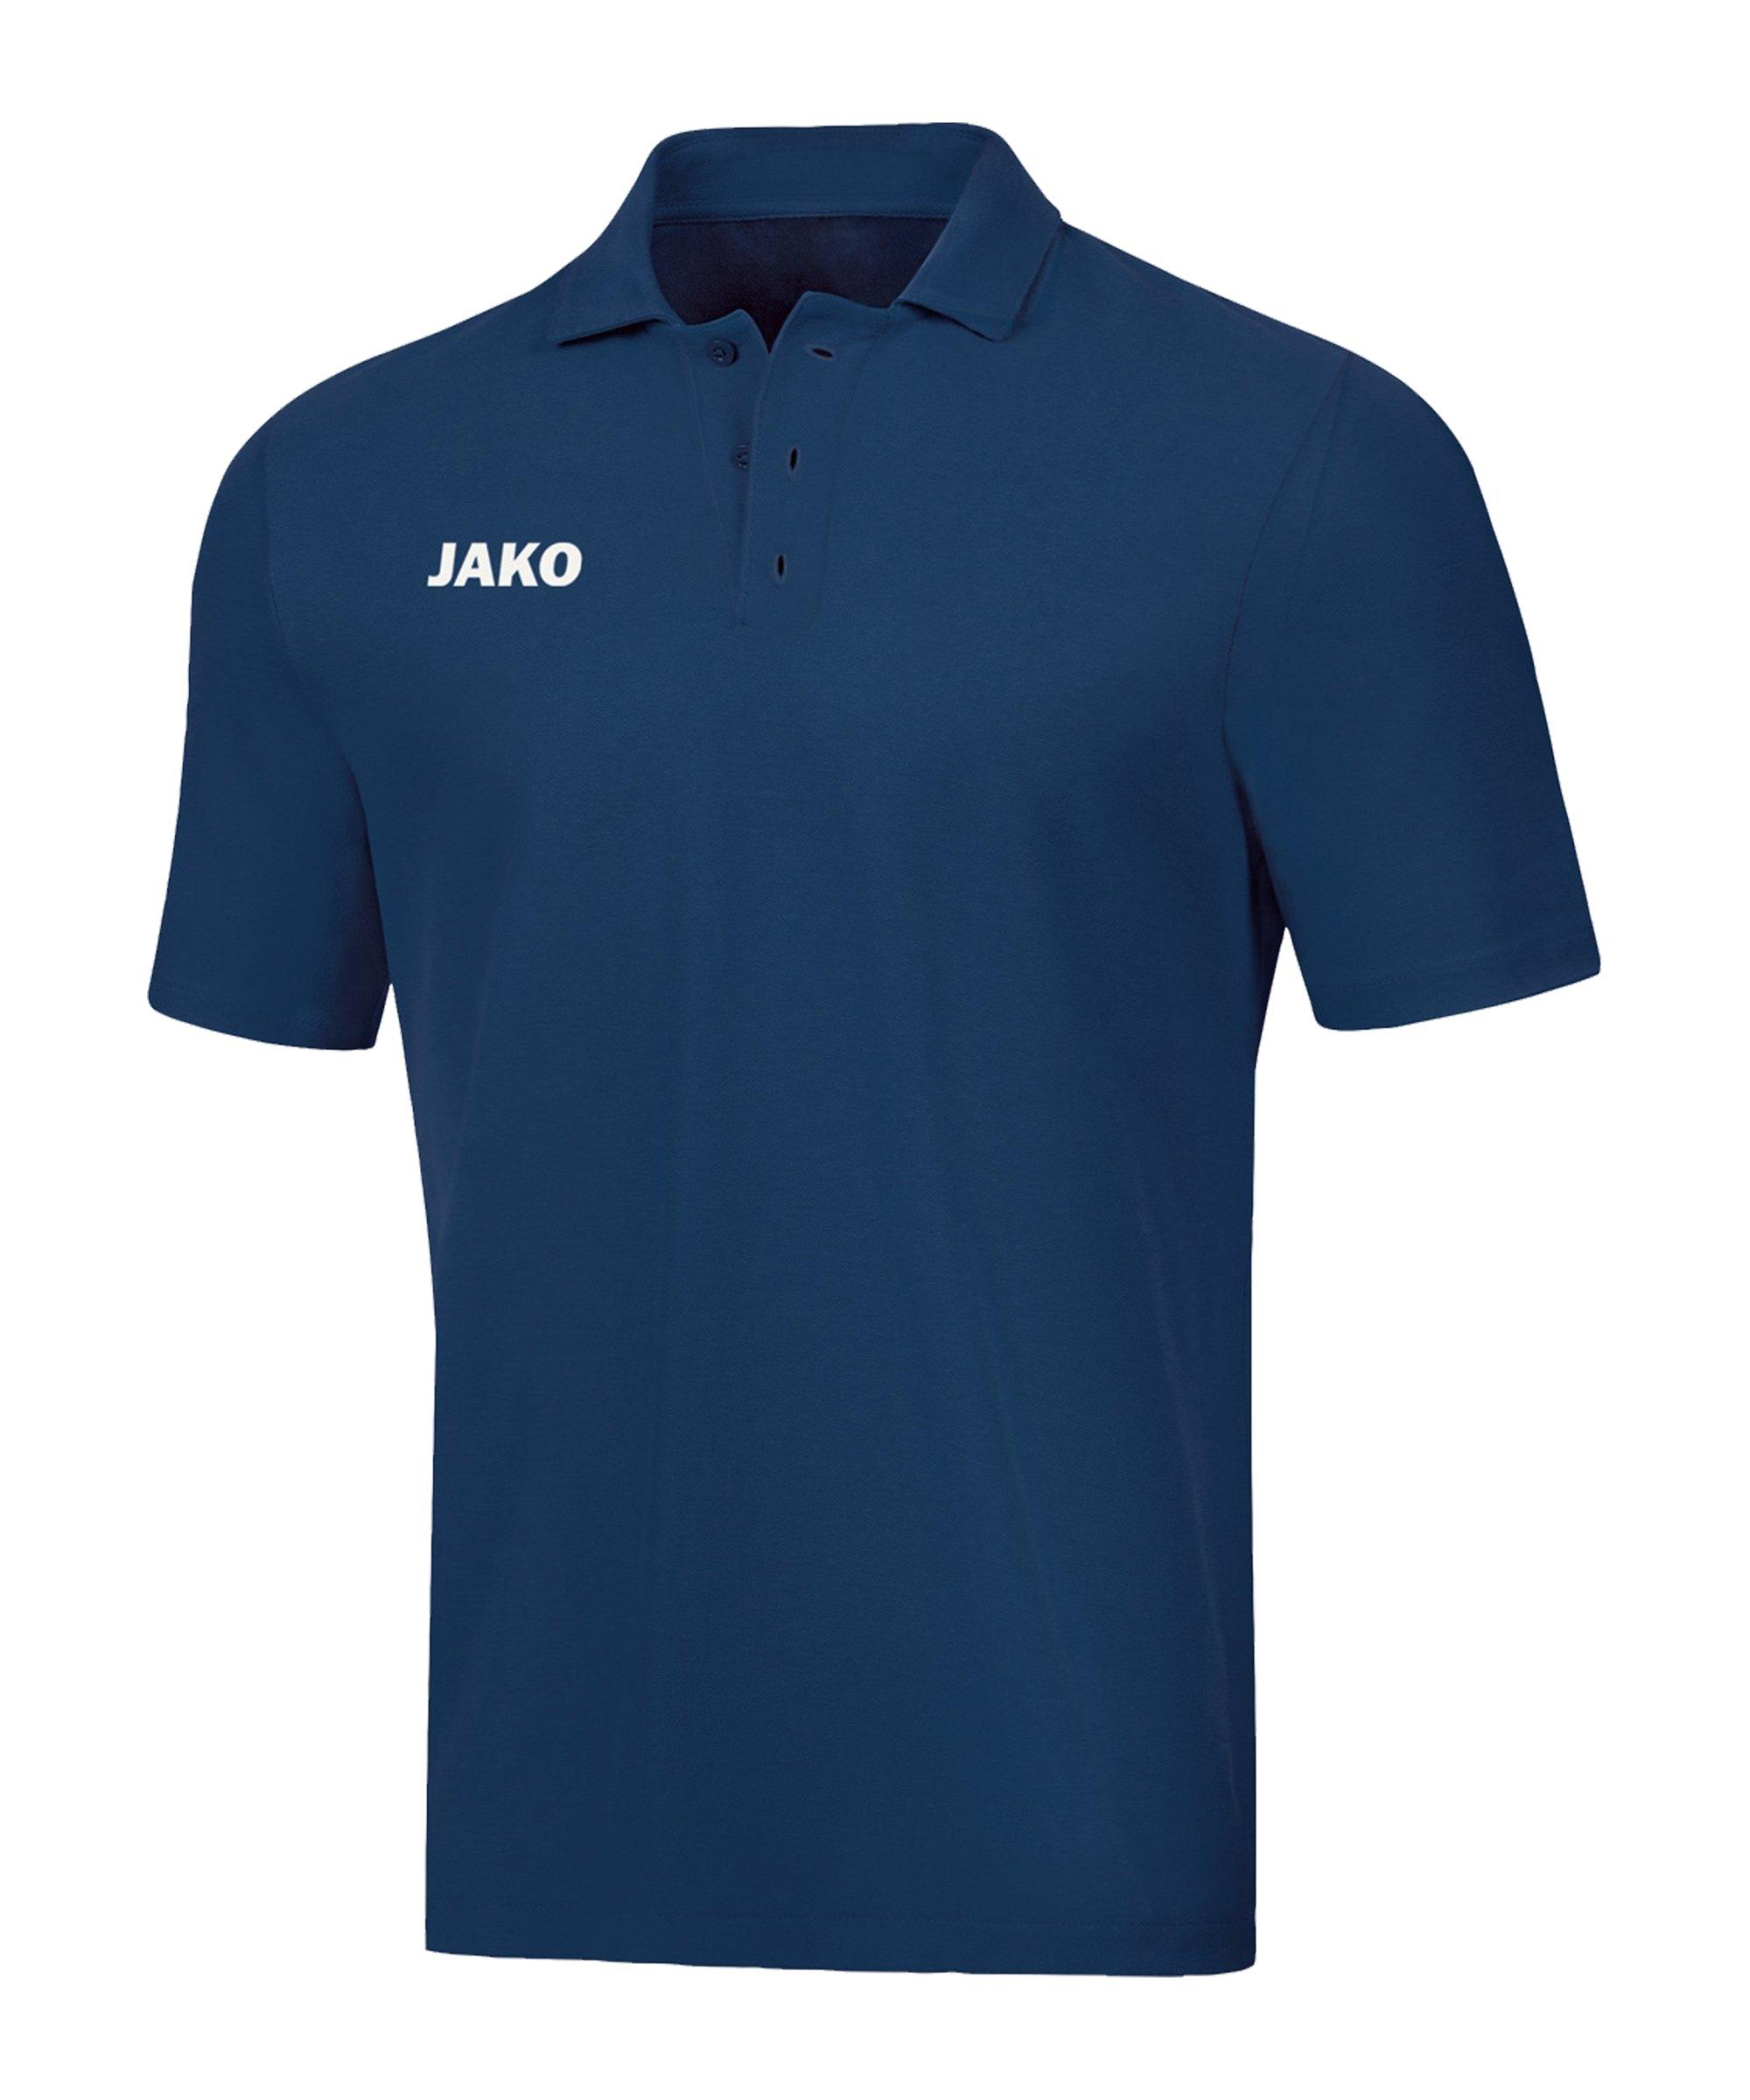 JAKO Base Poloshirt Damen Blau F09 - blau